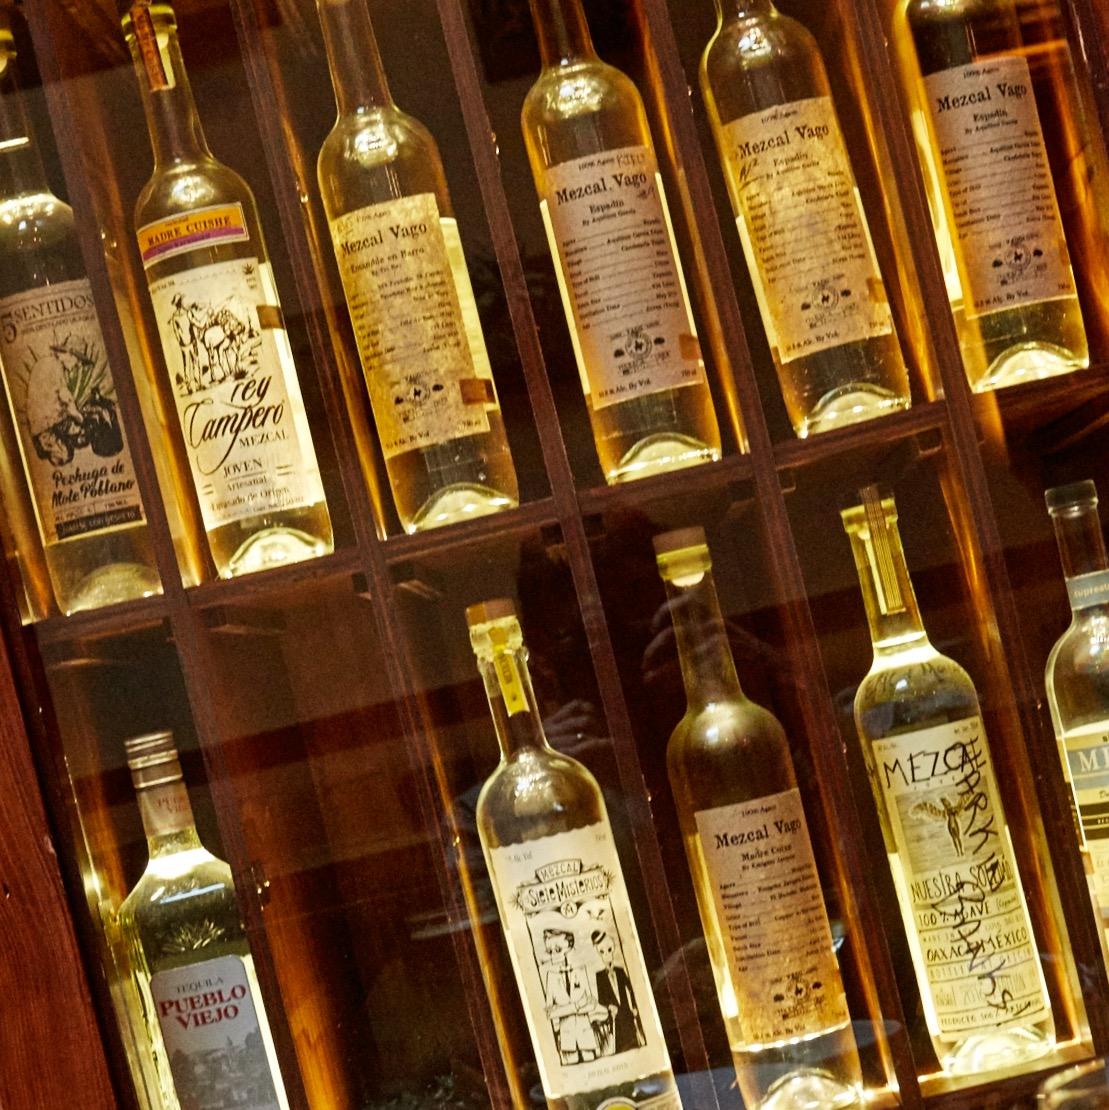 Mezcal bottles in Locker